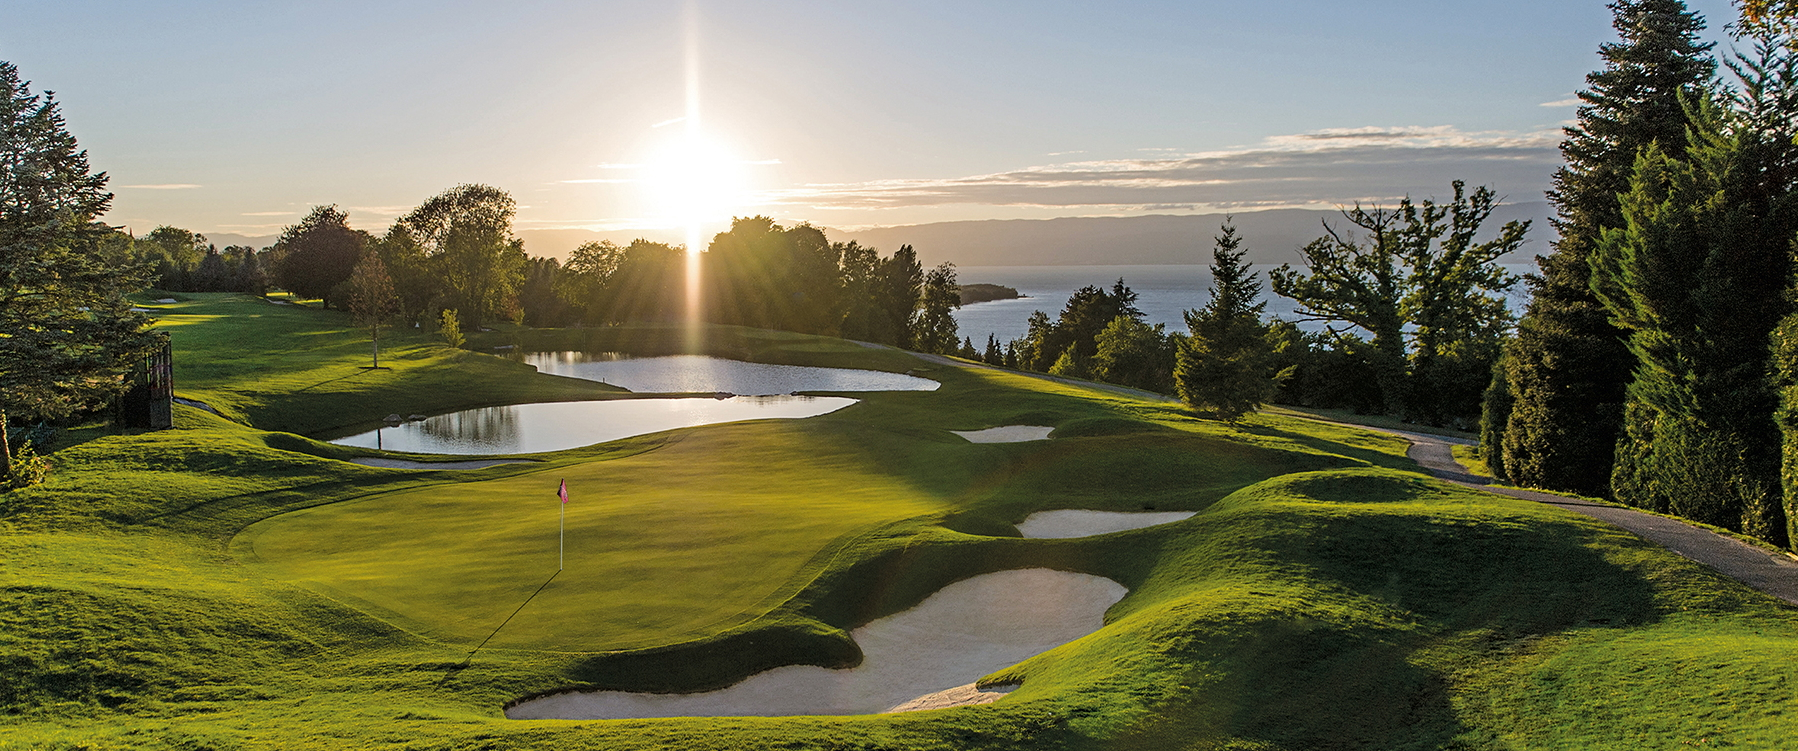 The sun setting over a golf green in EA Sports PGA Tour